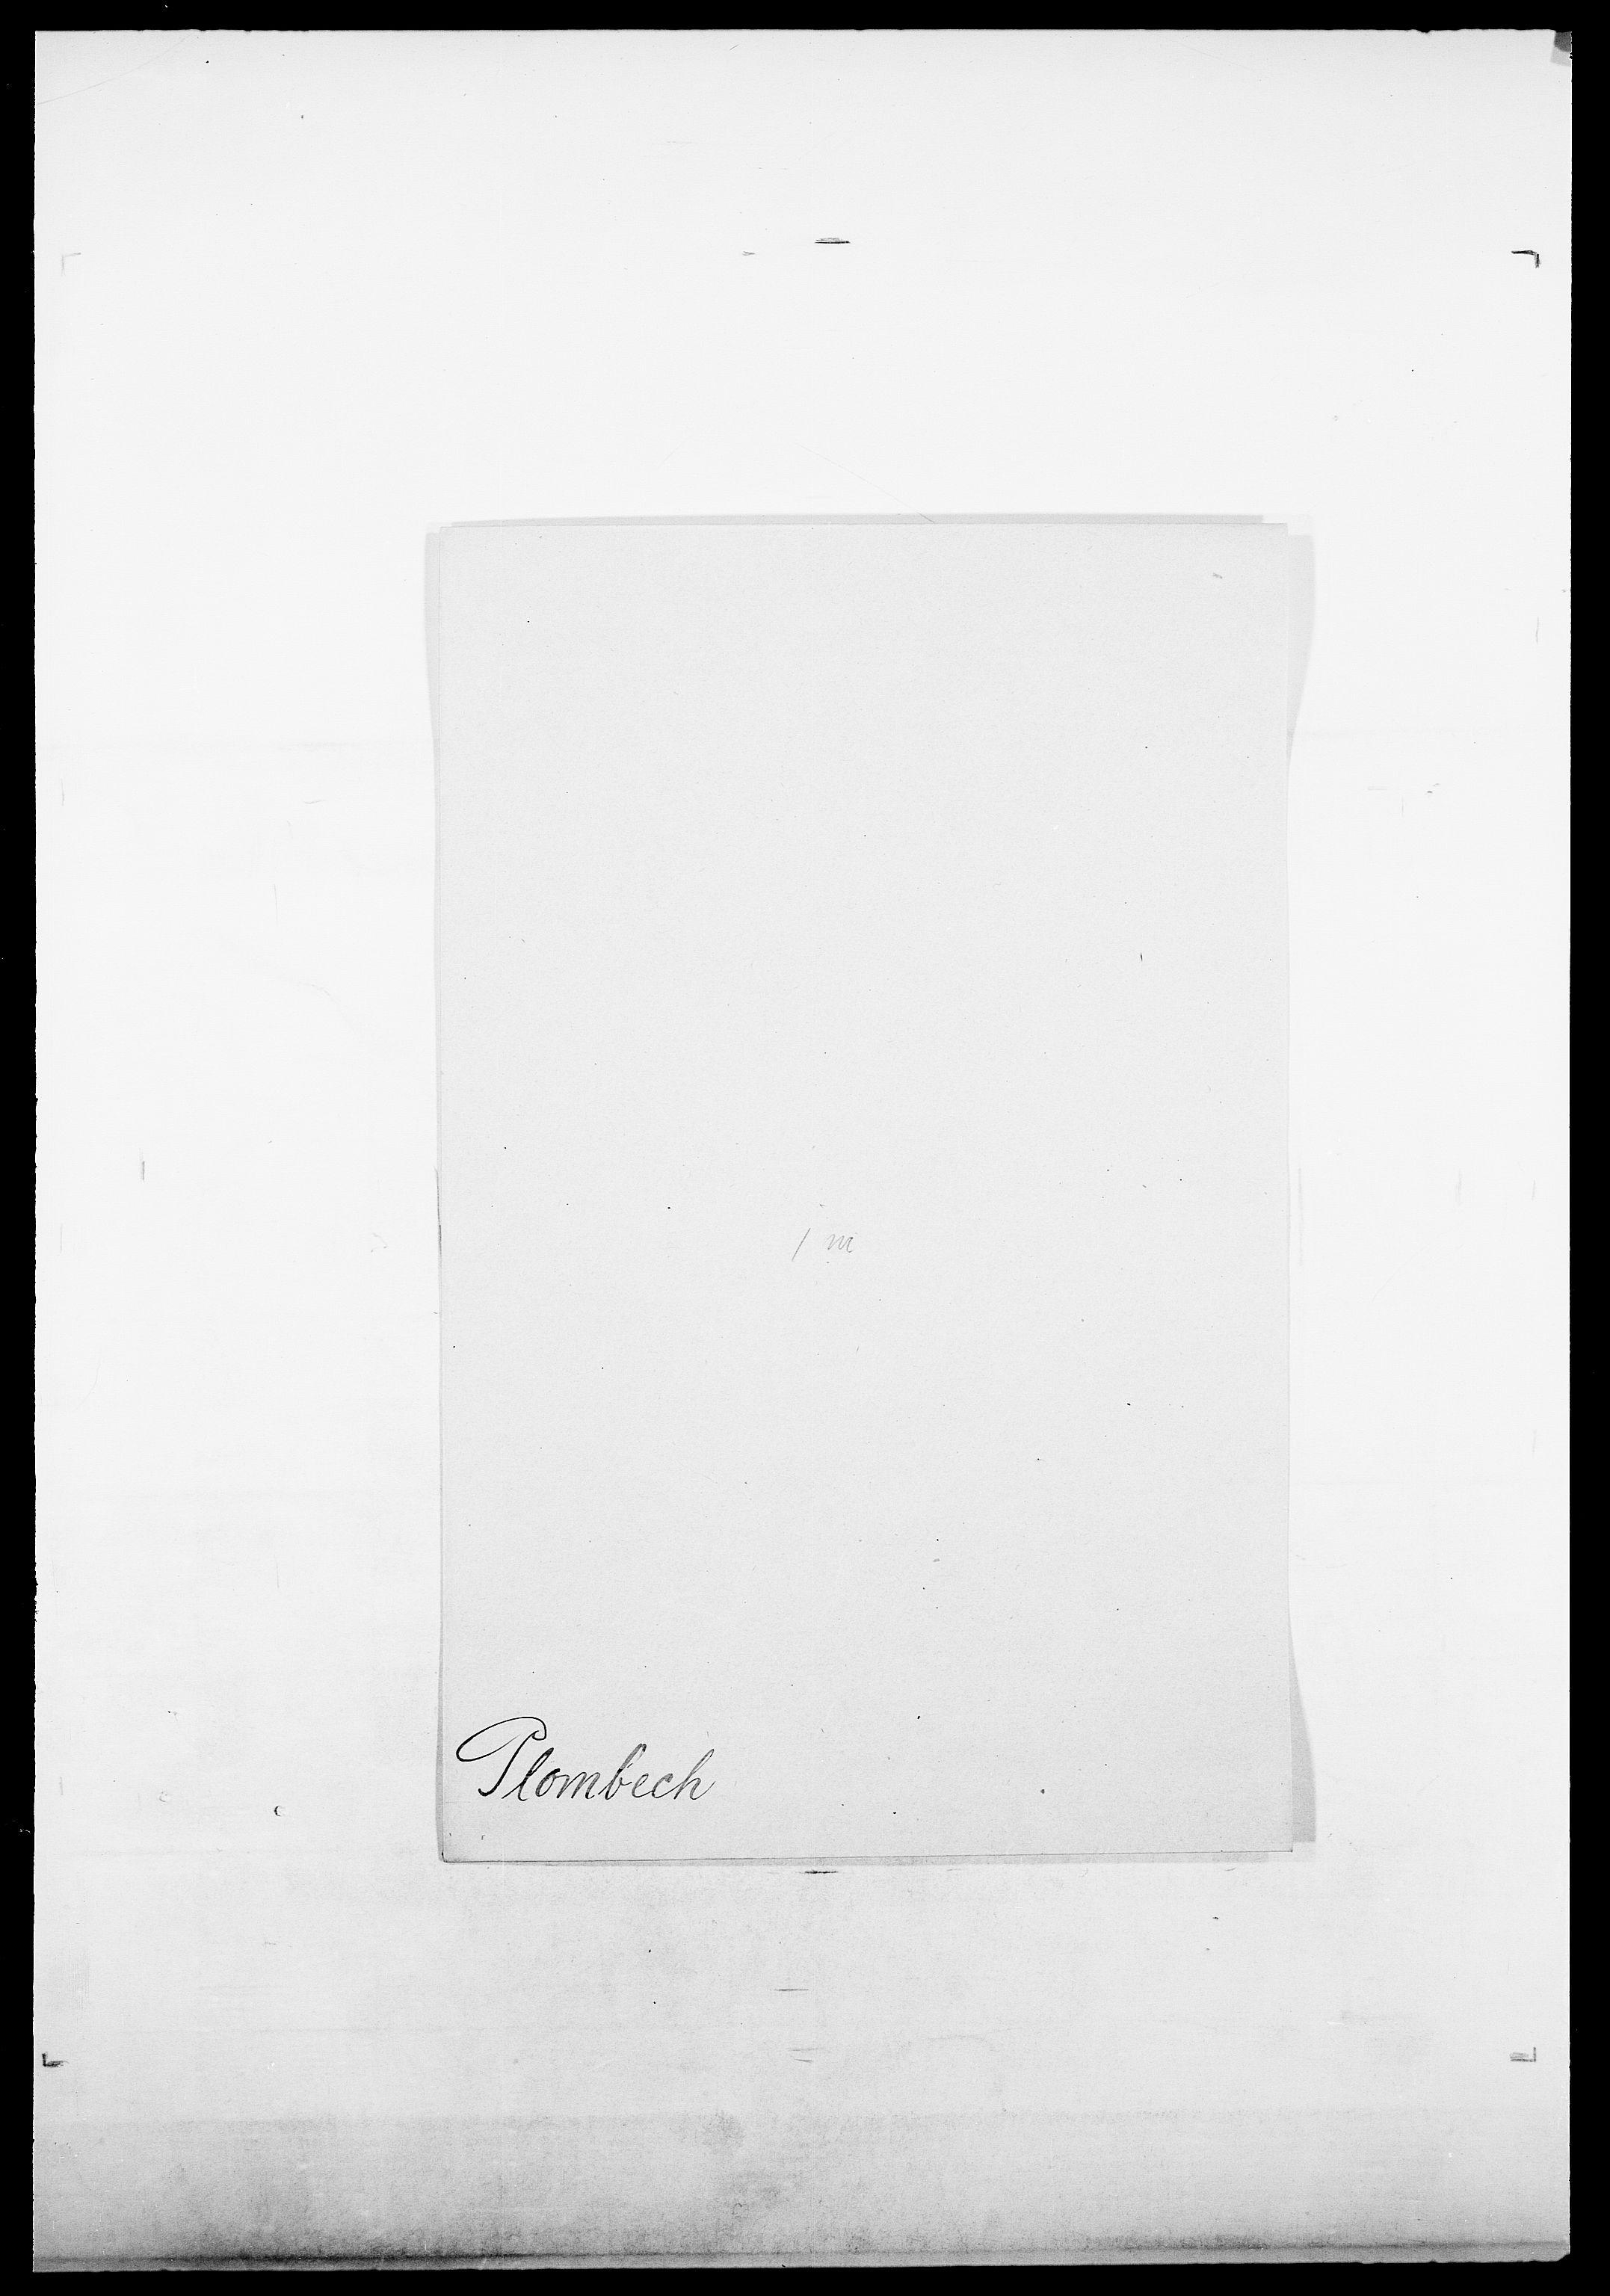 SAO, Delgobe, Charles Antoine - samling, D/Da/L0031: de Place - Raaum, s. 128